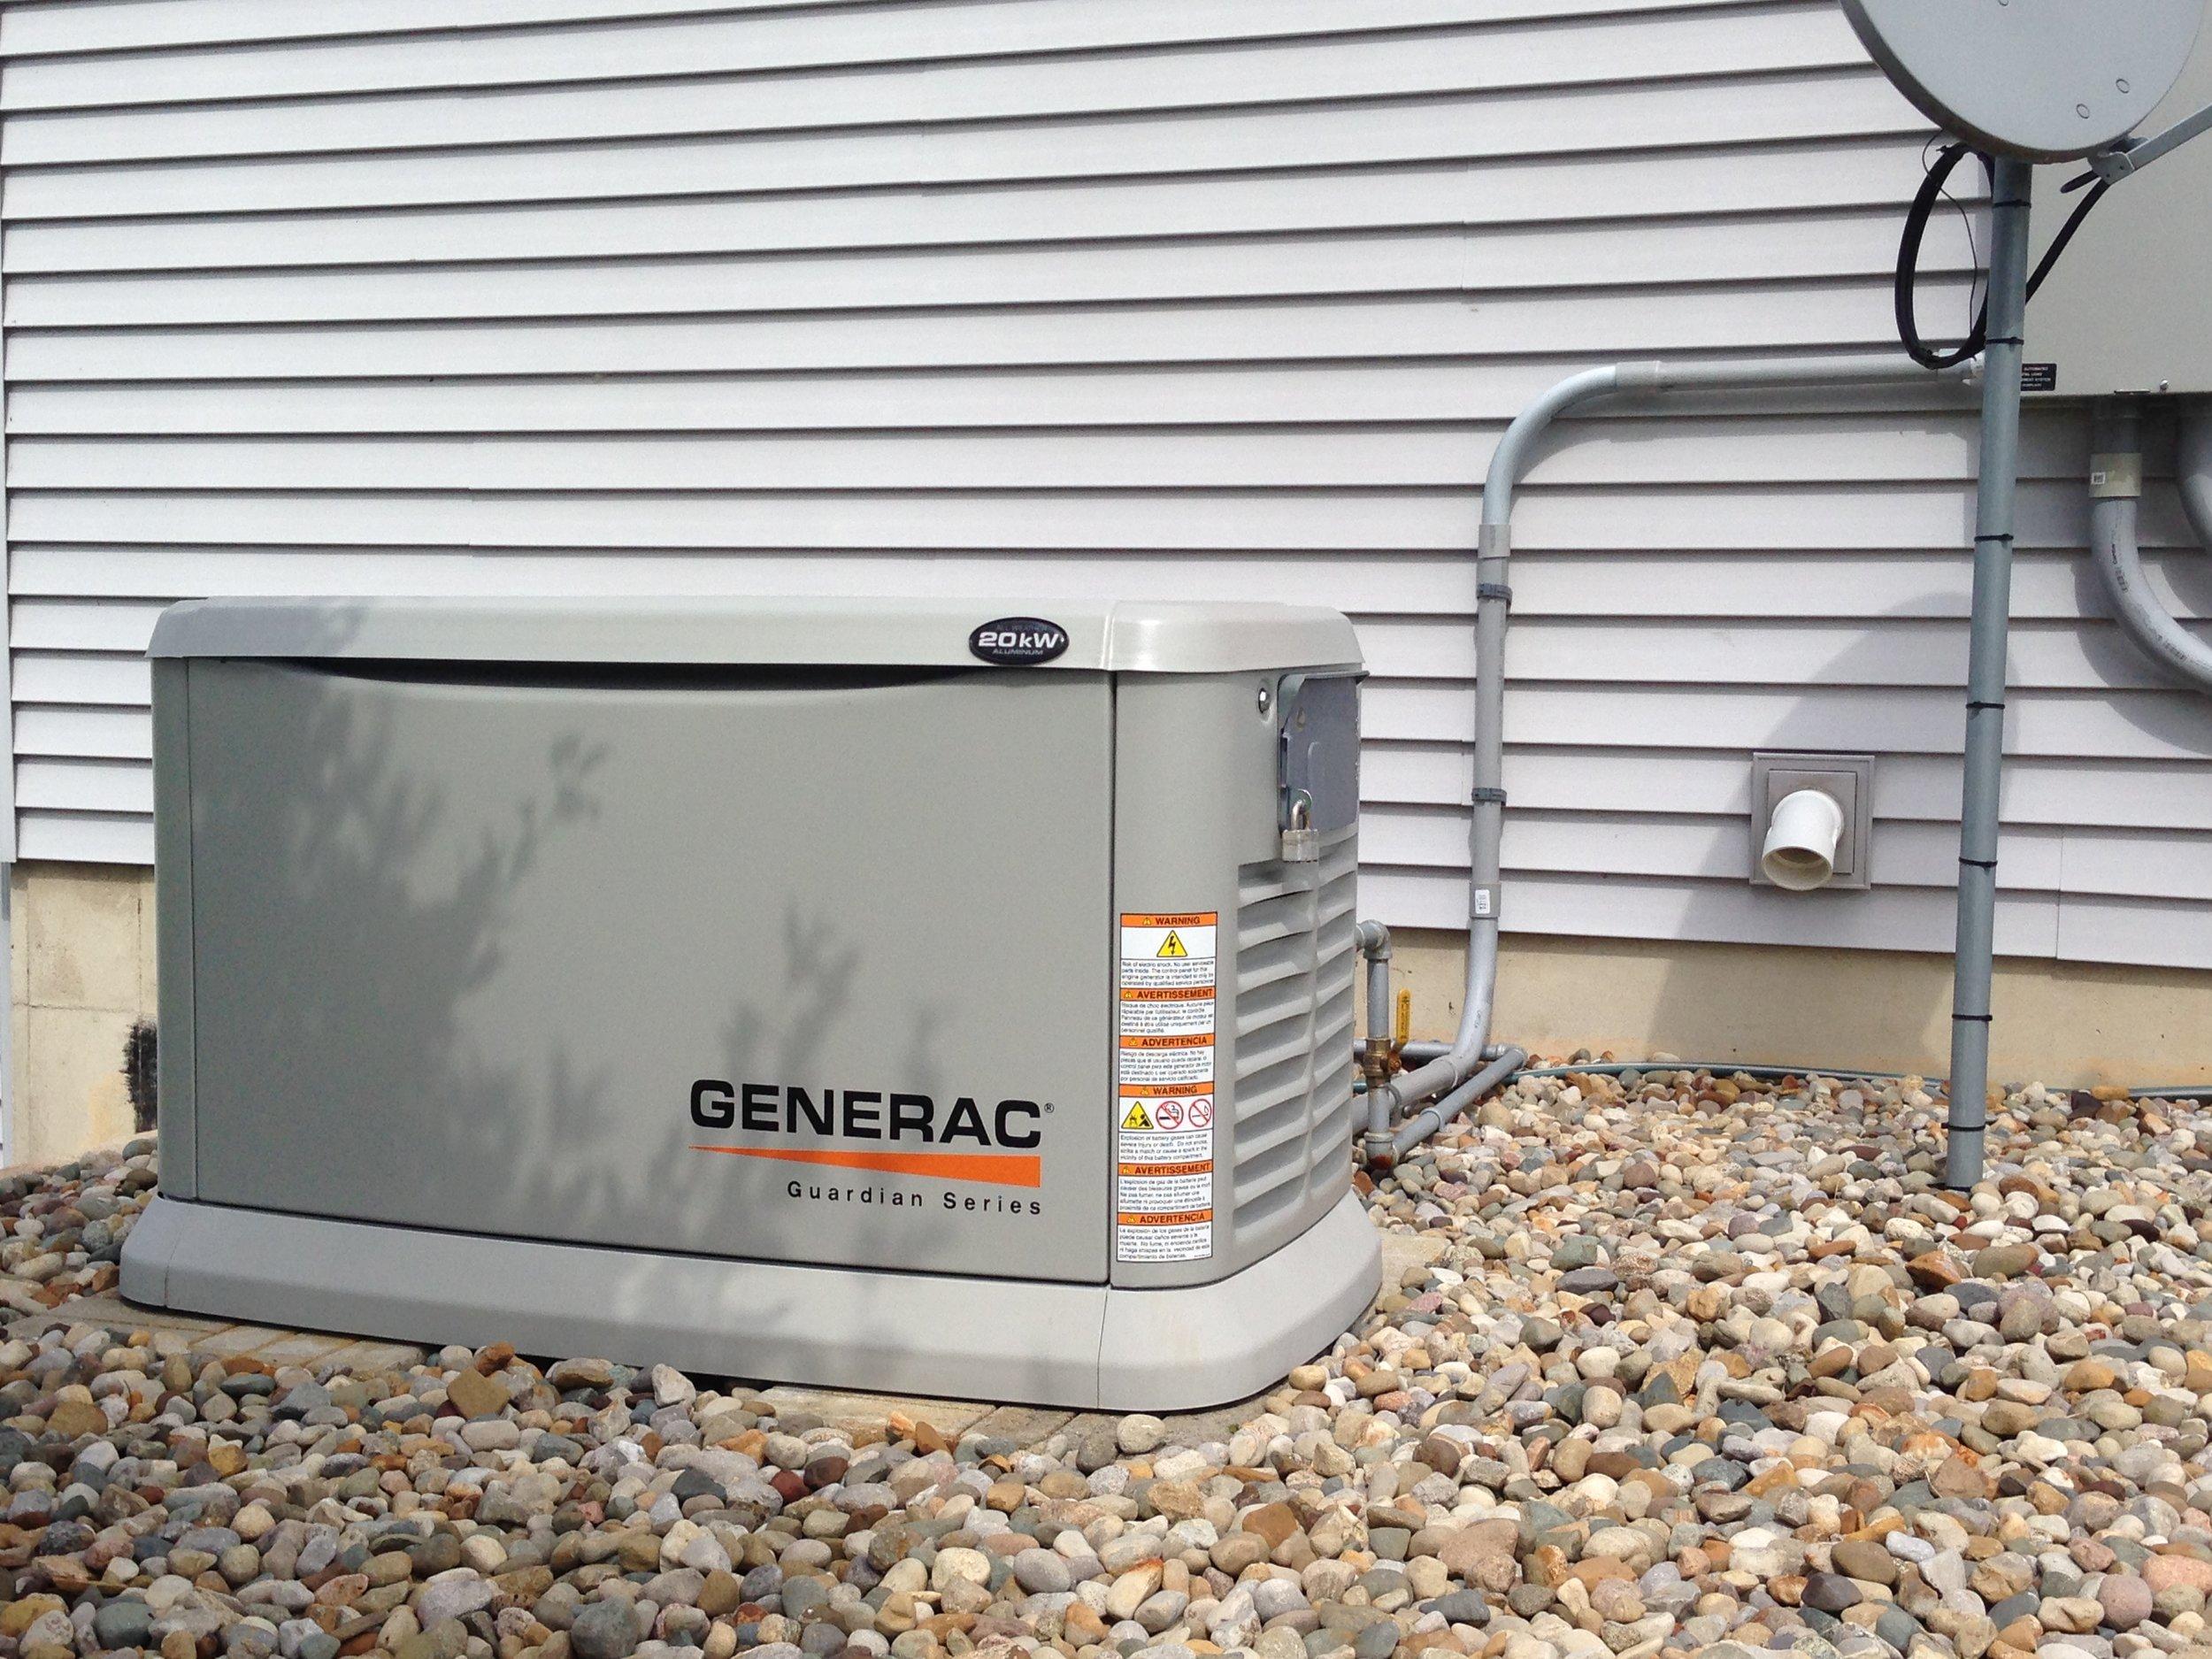 Generac-Standby-Power-Generator-Installation.jpg